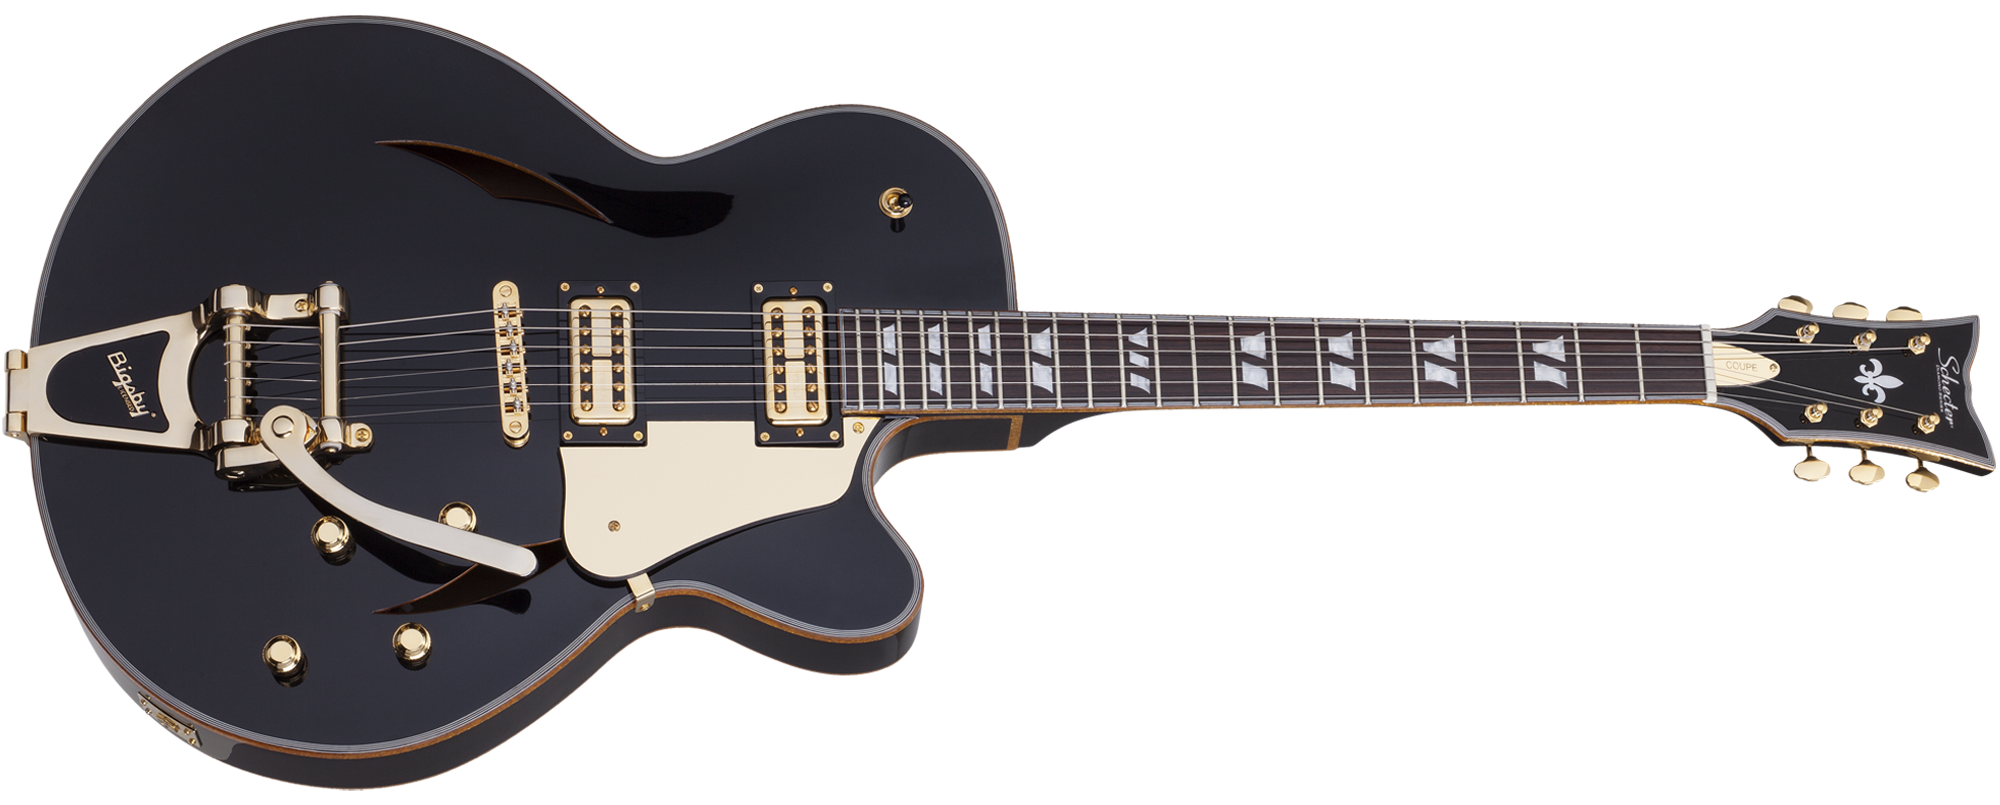 Coupe Gloss Black (BLK) SKU #296